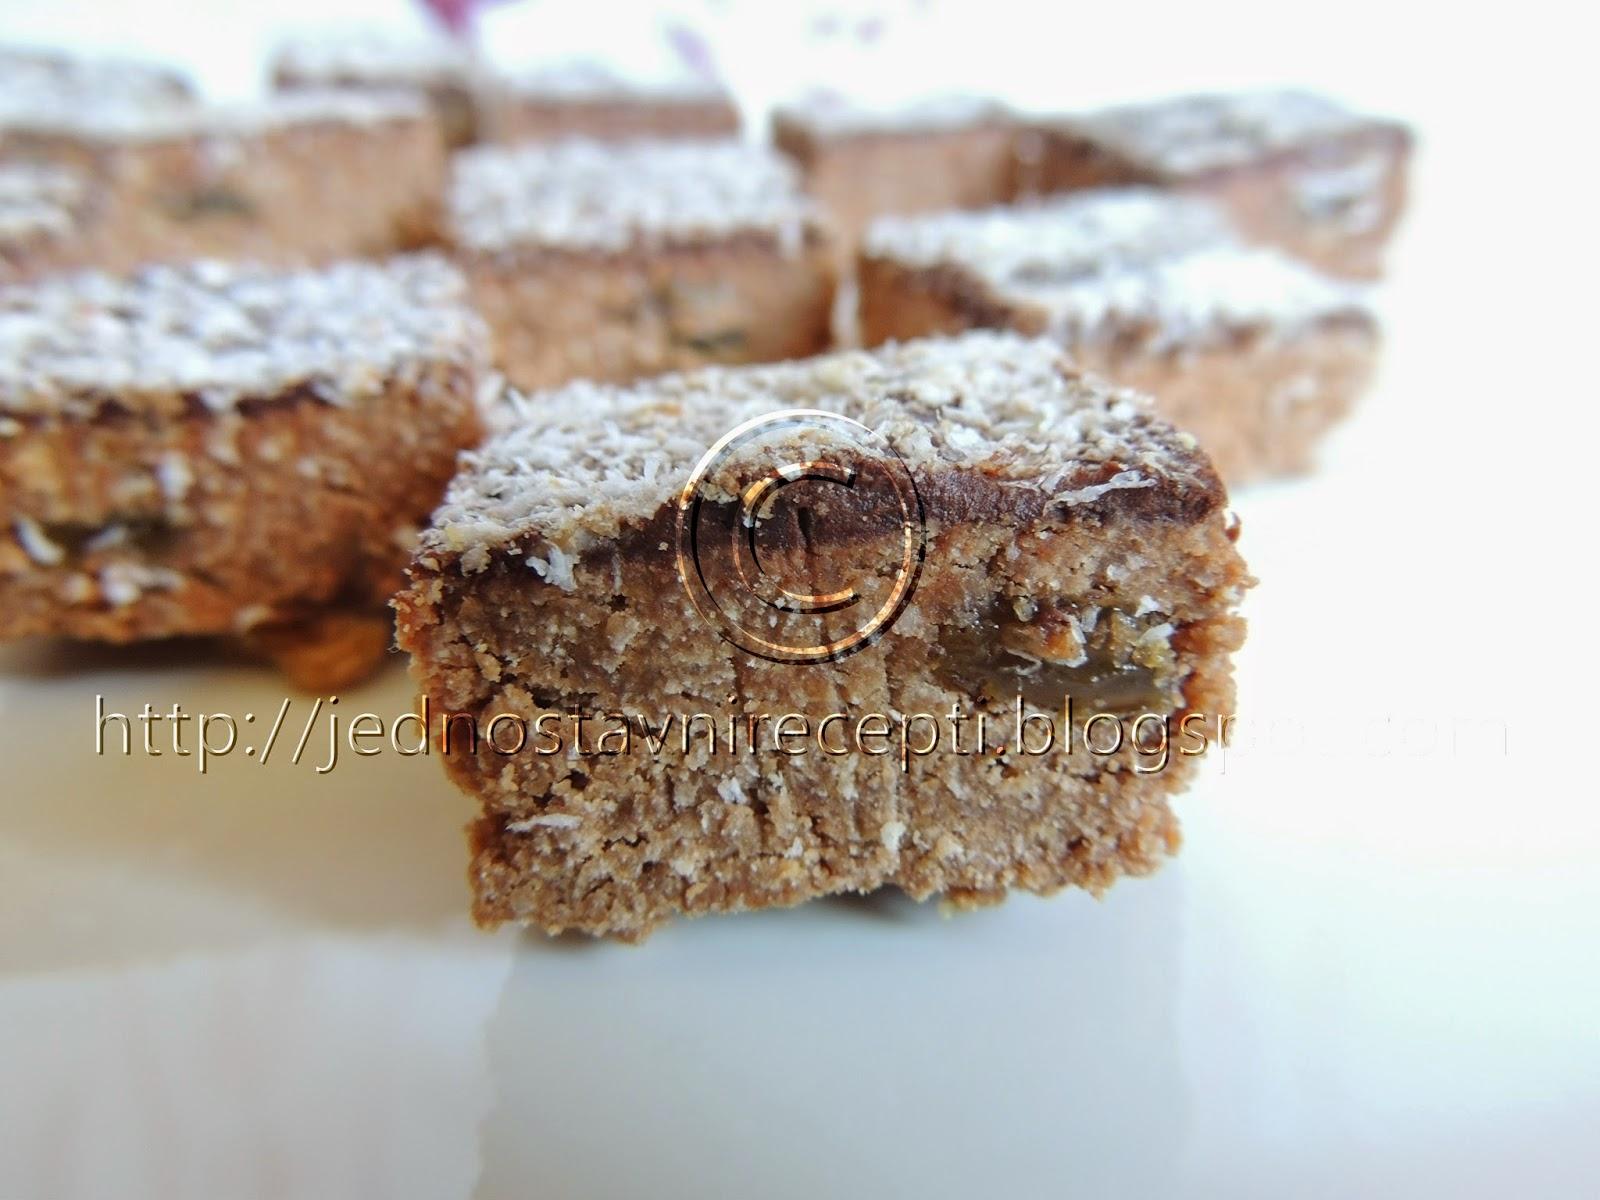 kokos kolac sa mlevenim plazma keksom